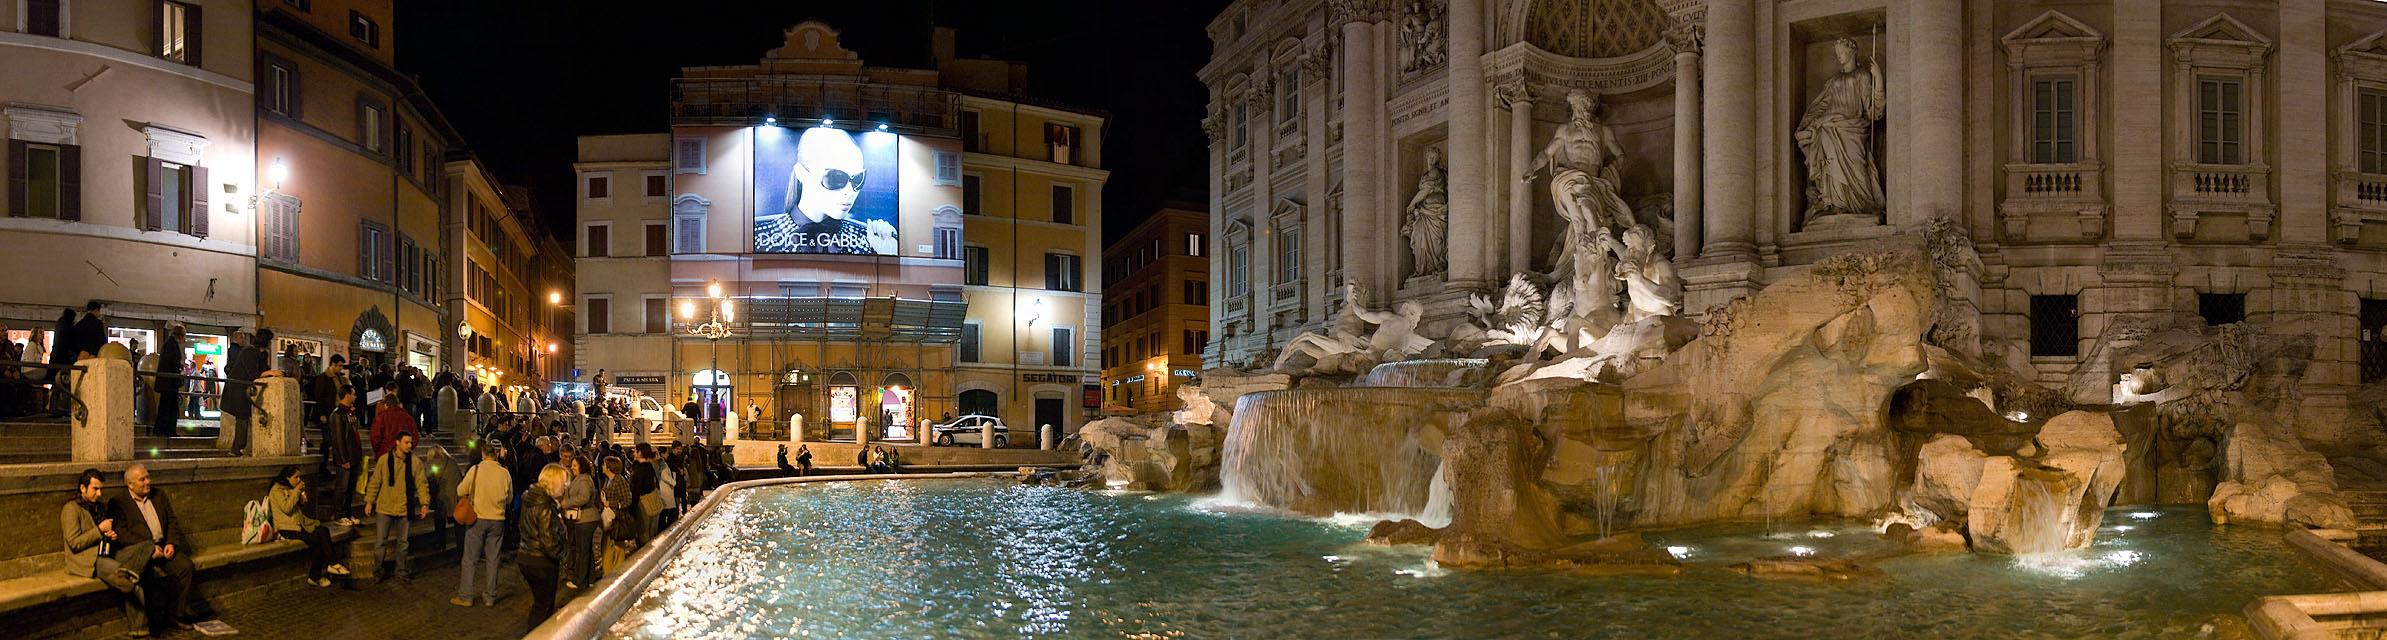 Trevi Fountain meets Dolce & Gabbana